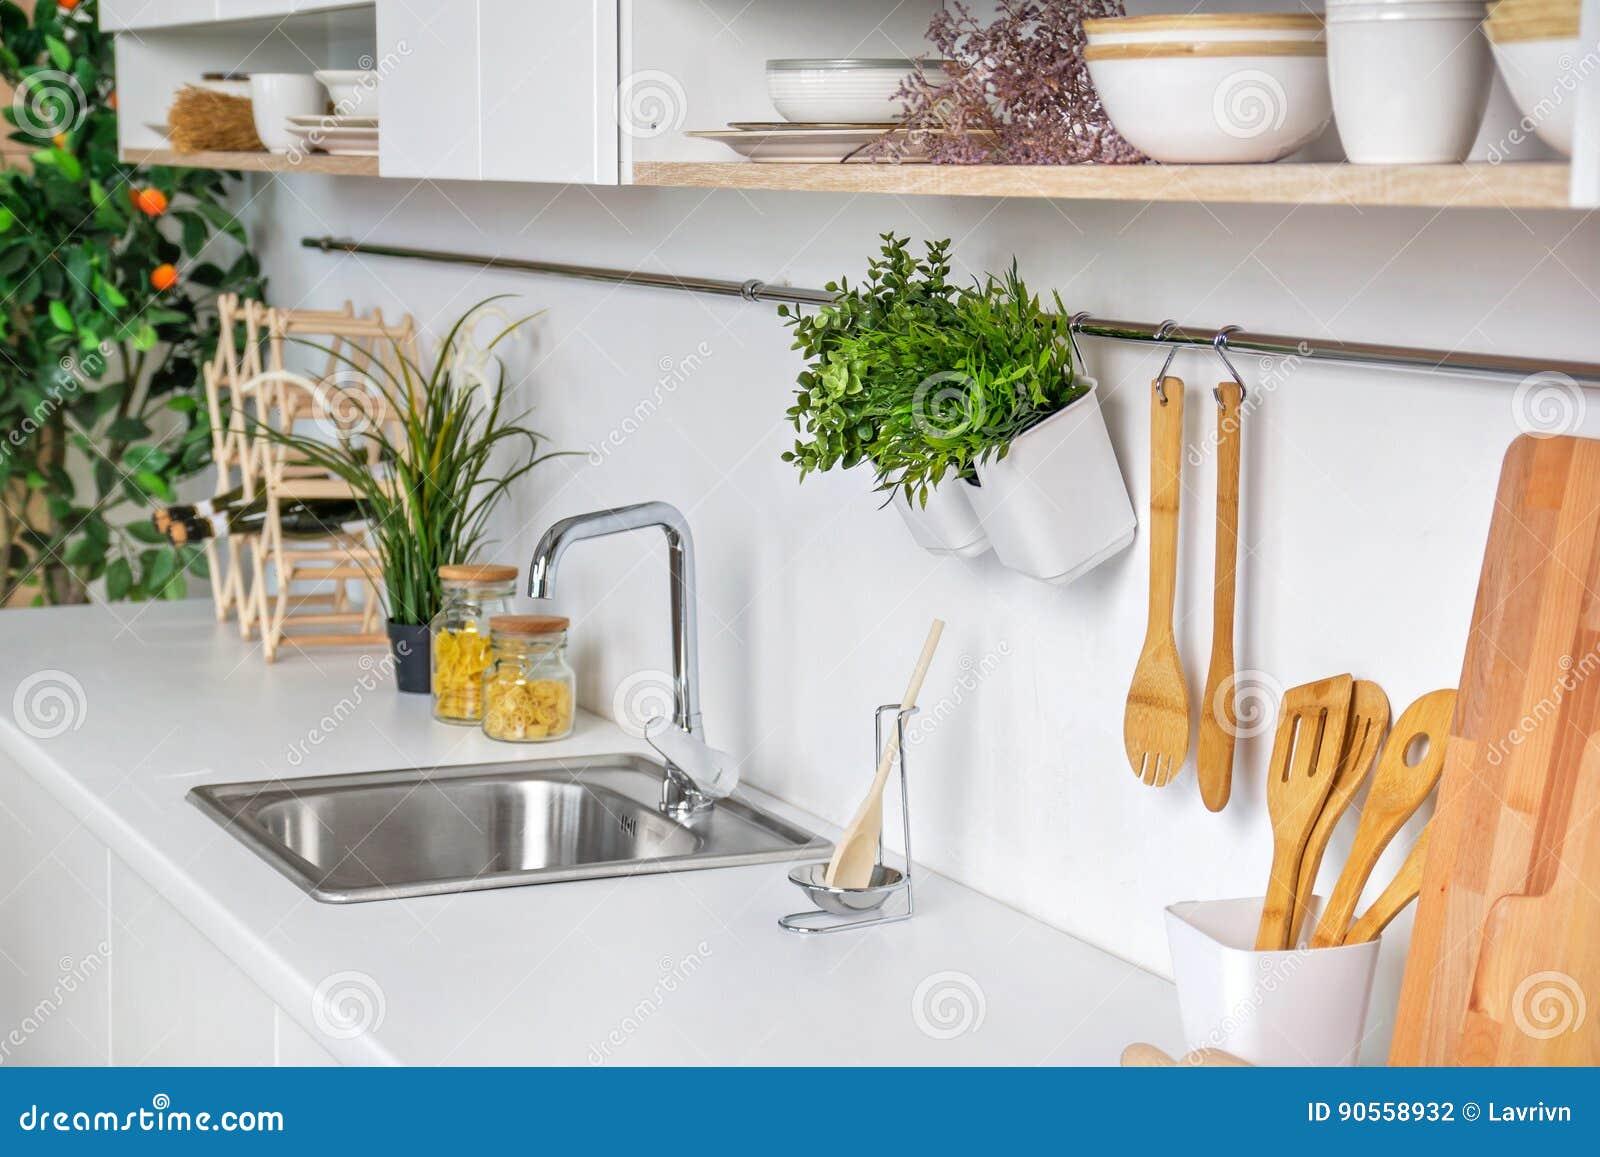 Closeup Of Interior Of Modern White Kitchen With Wooden Kitchenware ...